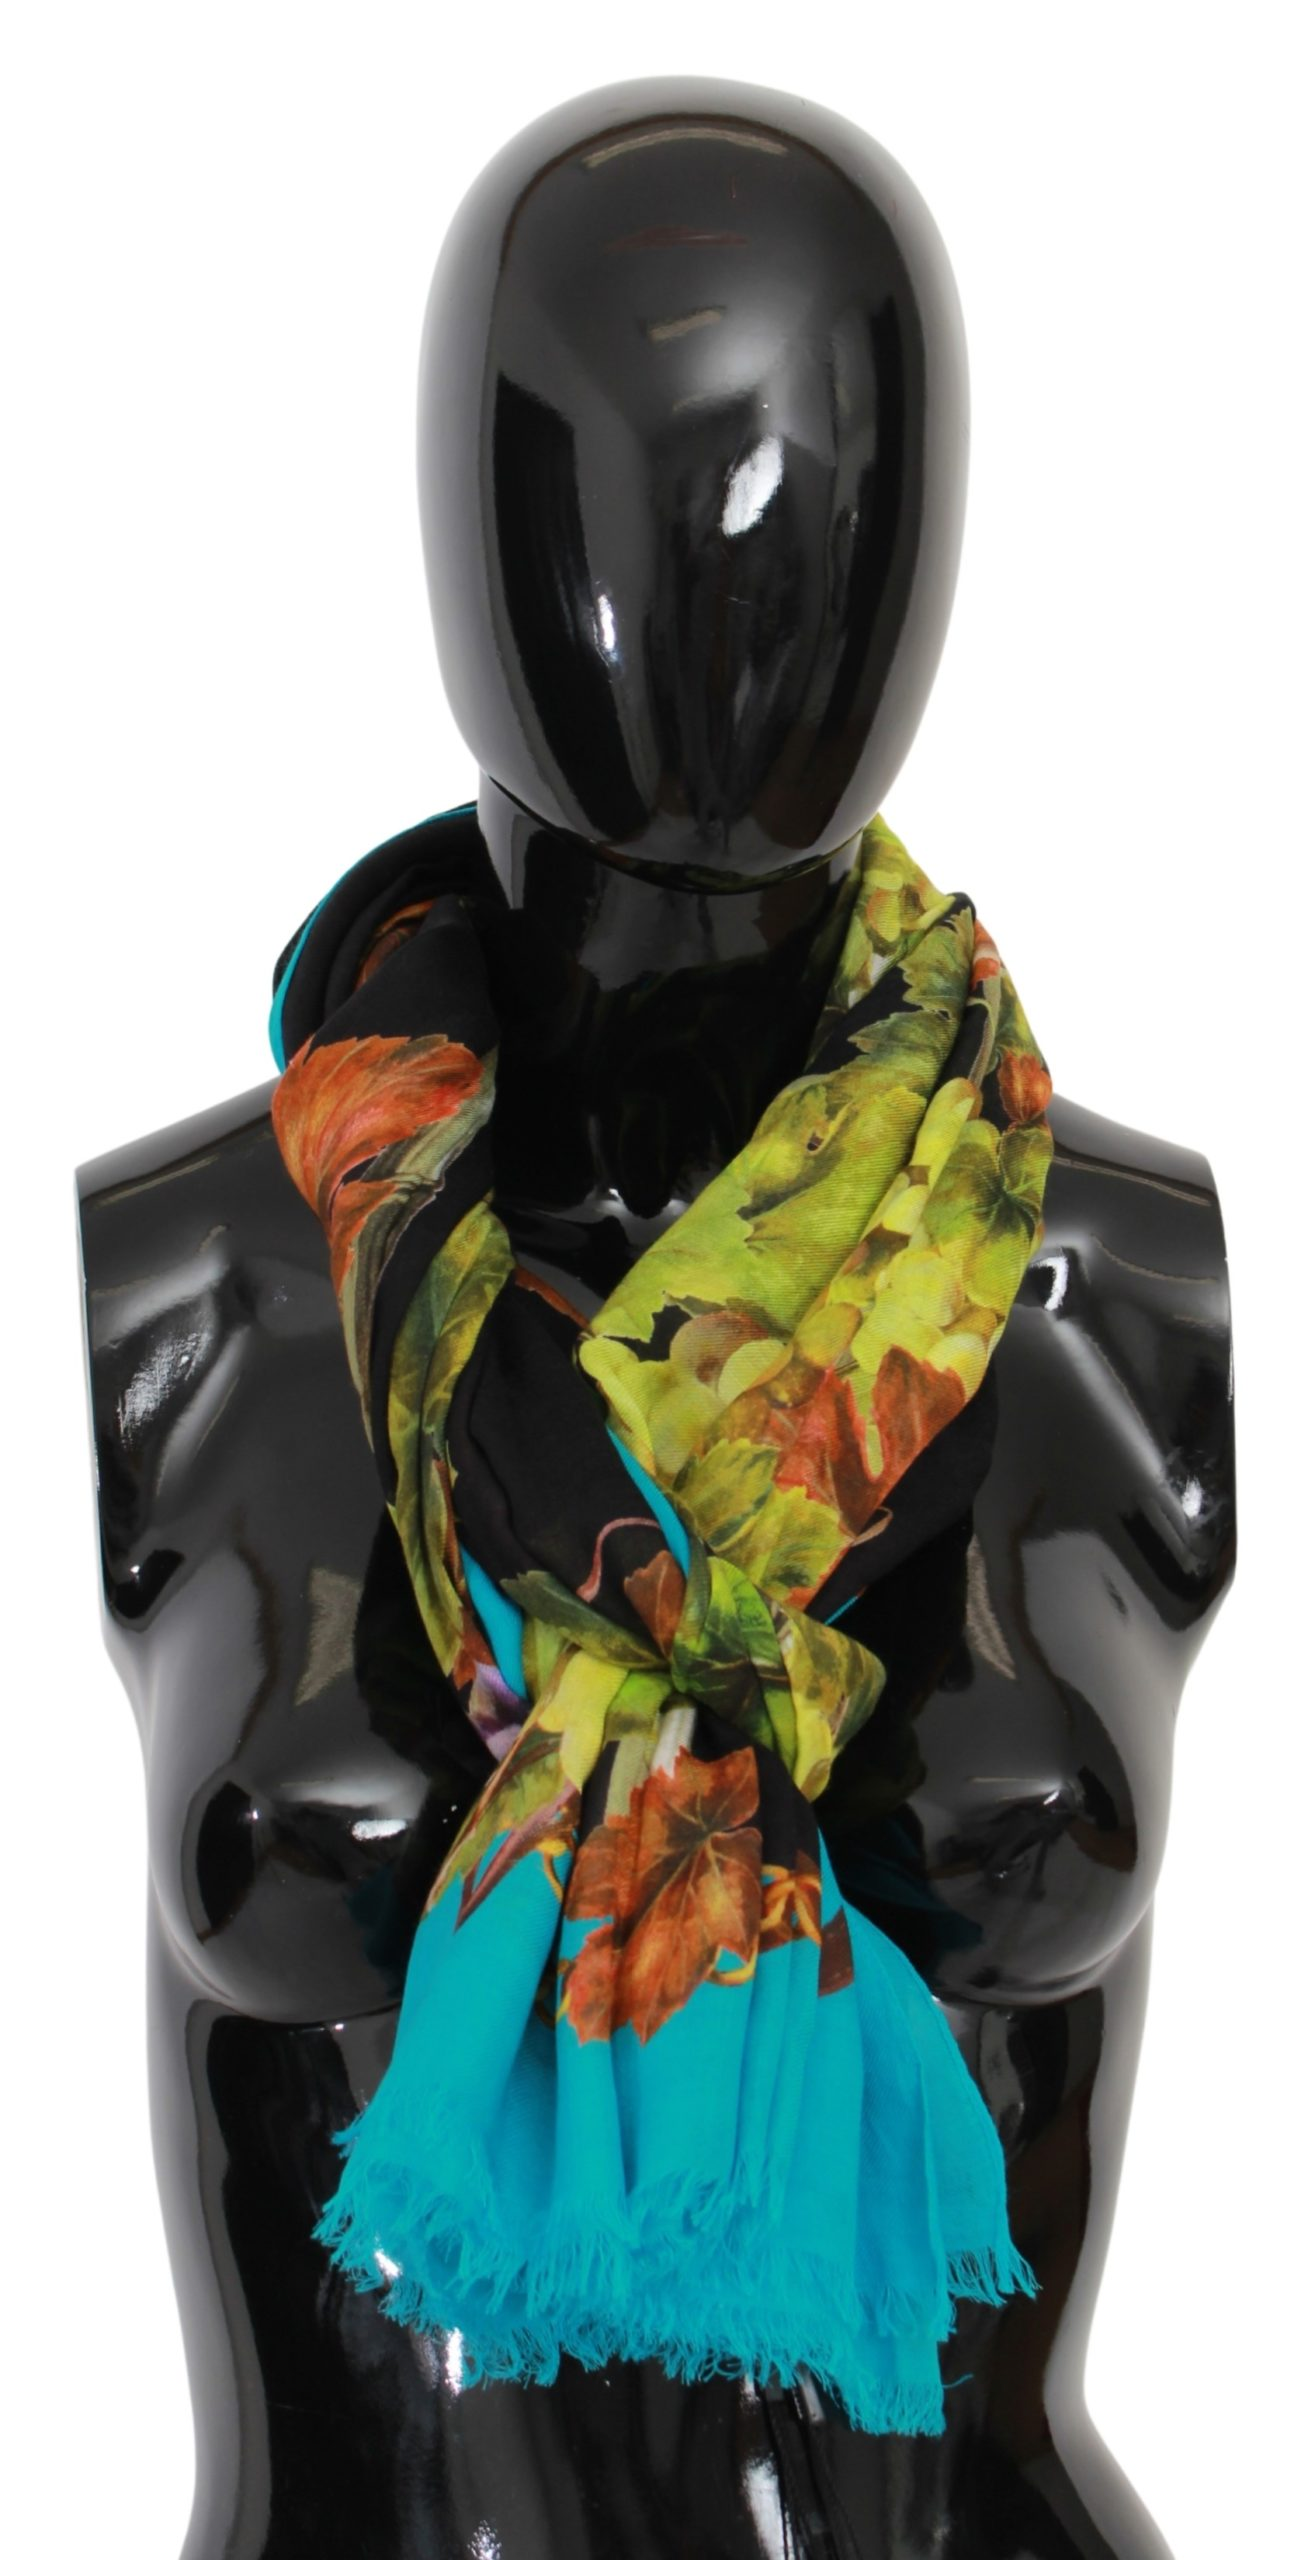 Dolce & Gabbana Women's Grapes Print Modal Scarf Multicolor MS1689